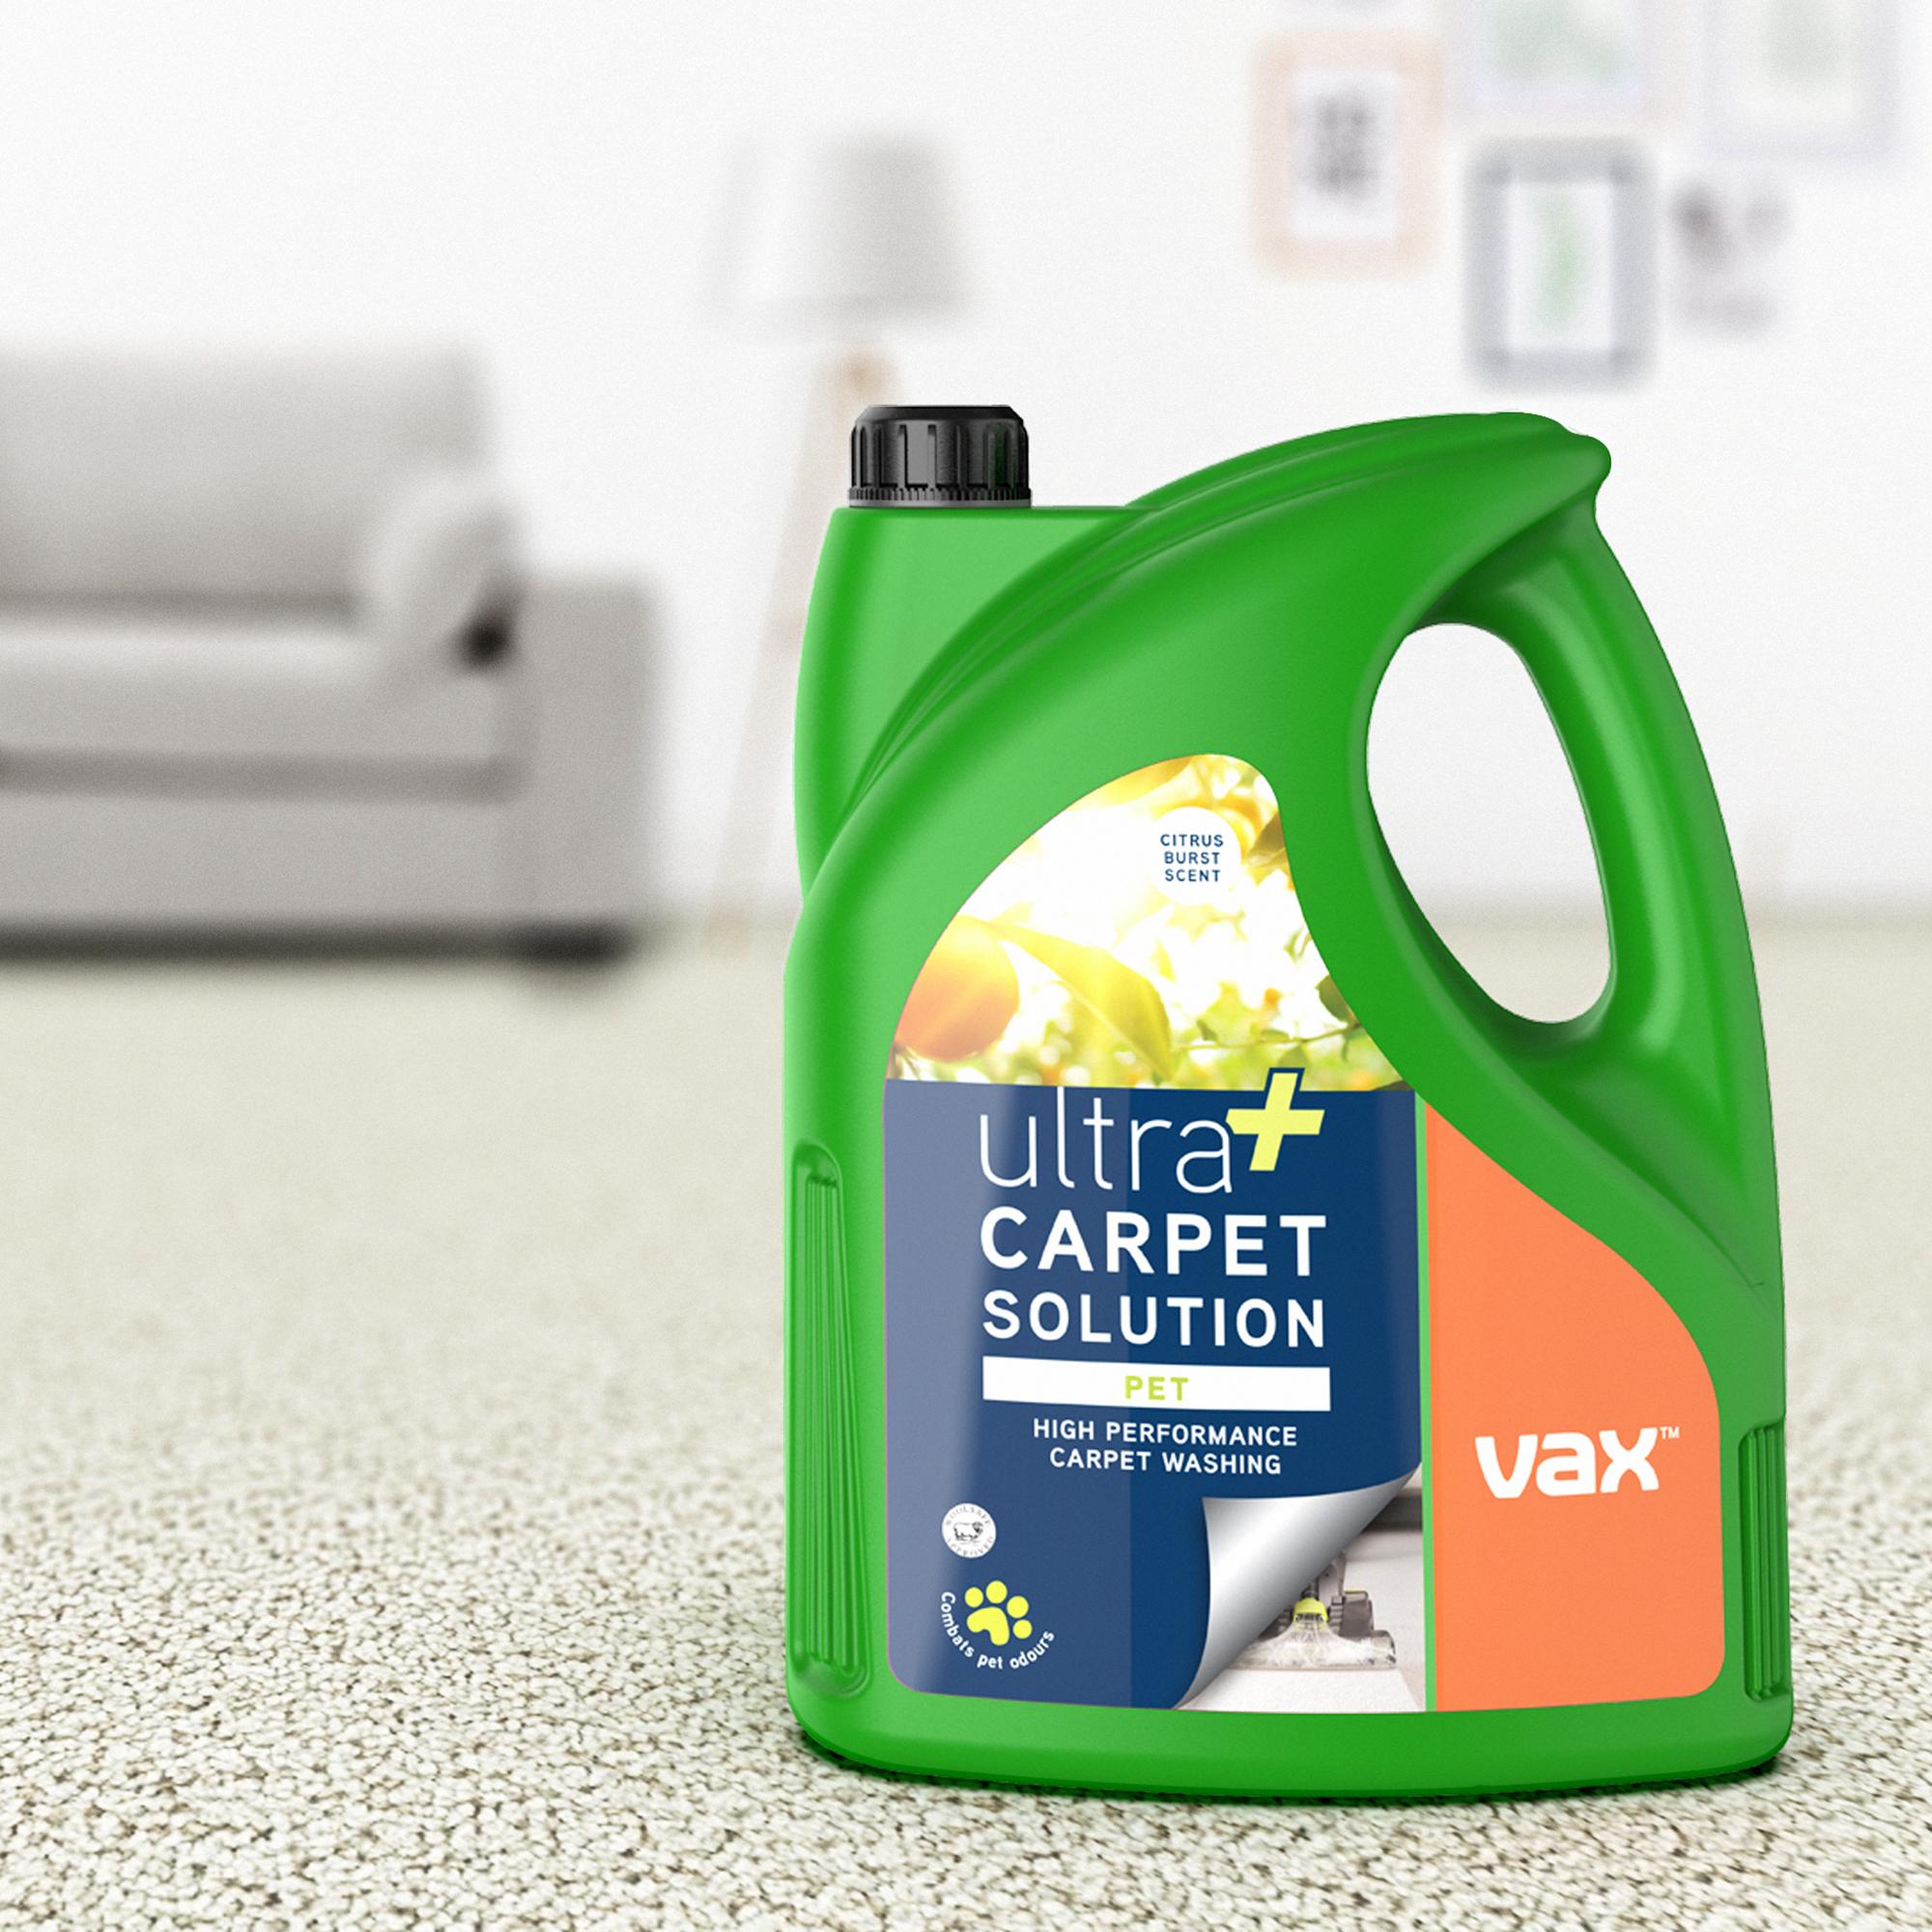 Vax Ultra Pet Carpet Cleaner Solution Carpet Vidalondon